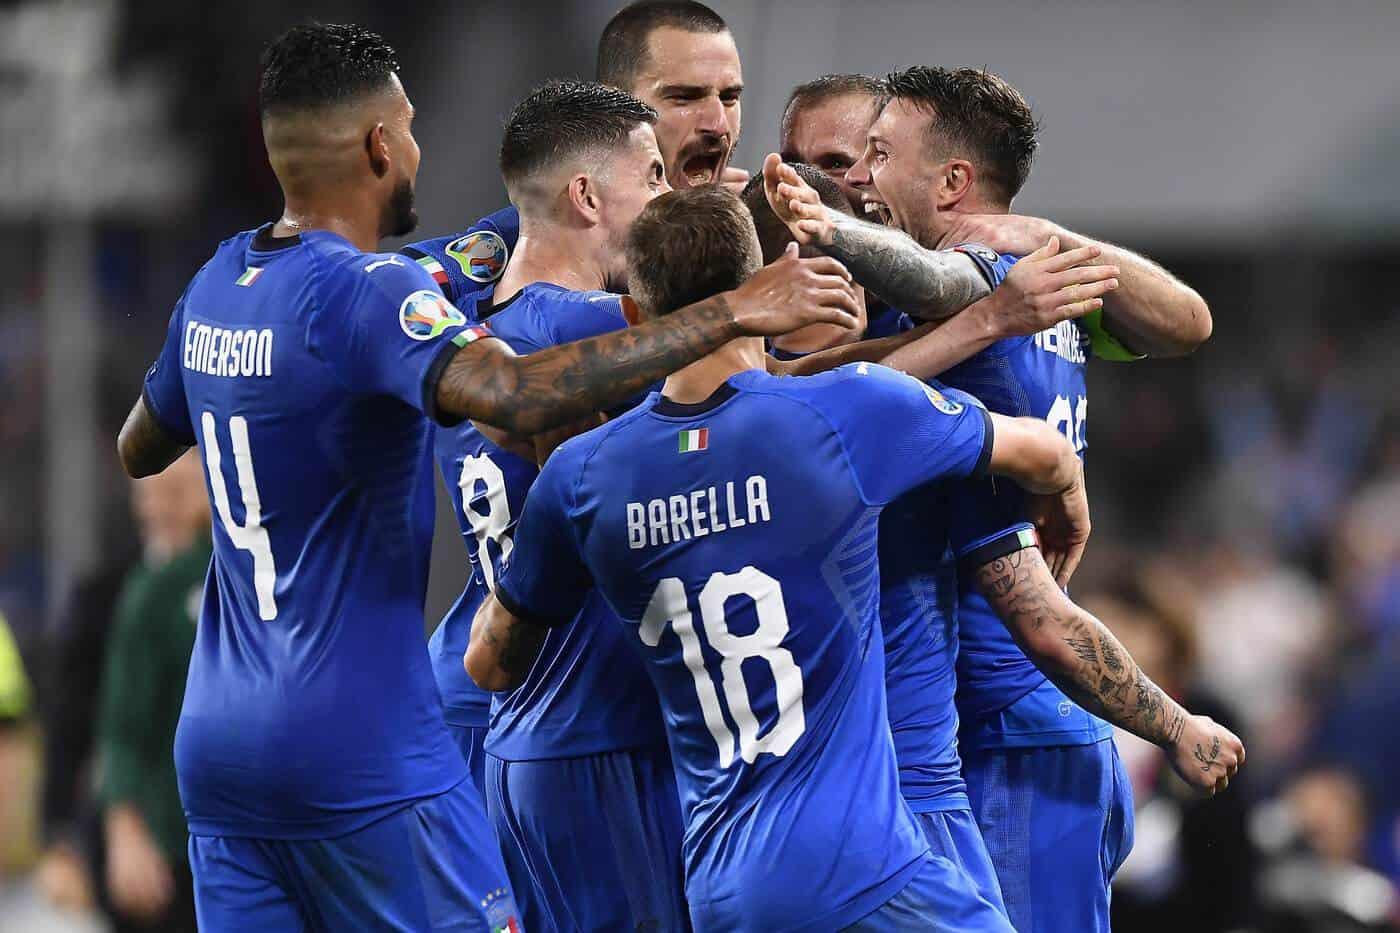 Italia vs Bosnia ed Erzegovina - Qualificazioni Euro 2020